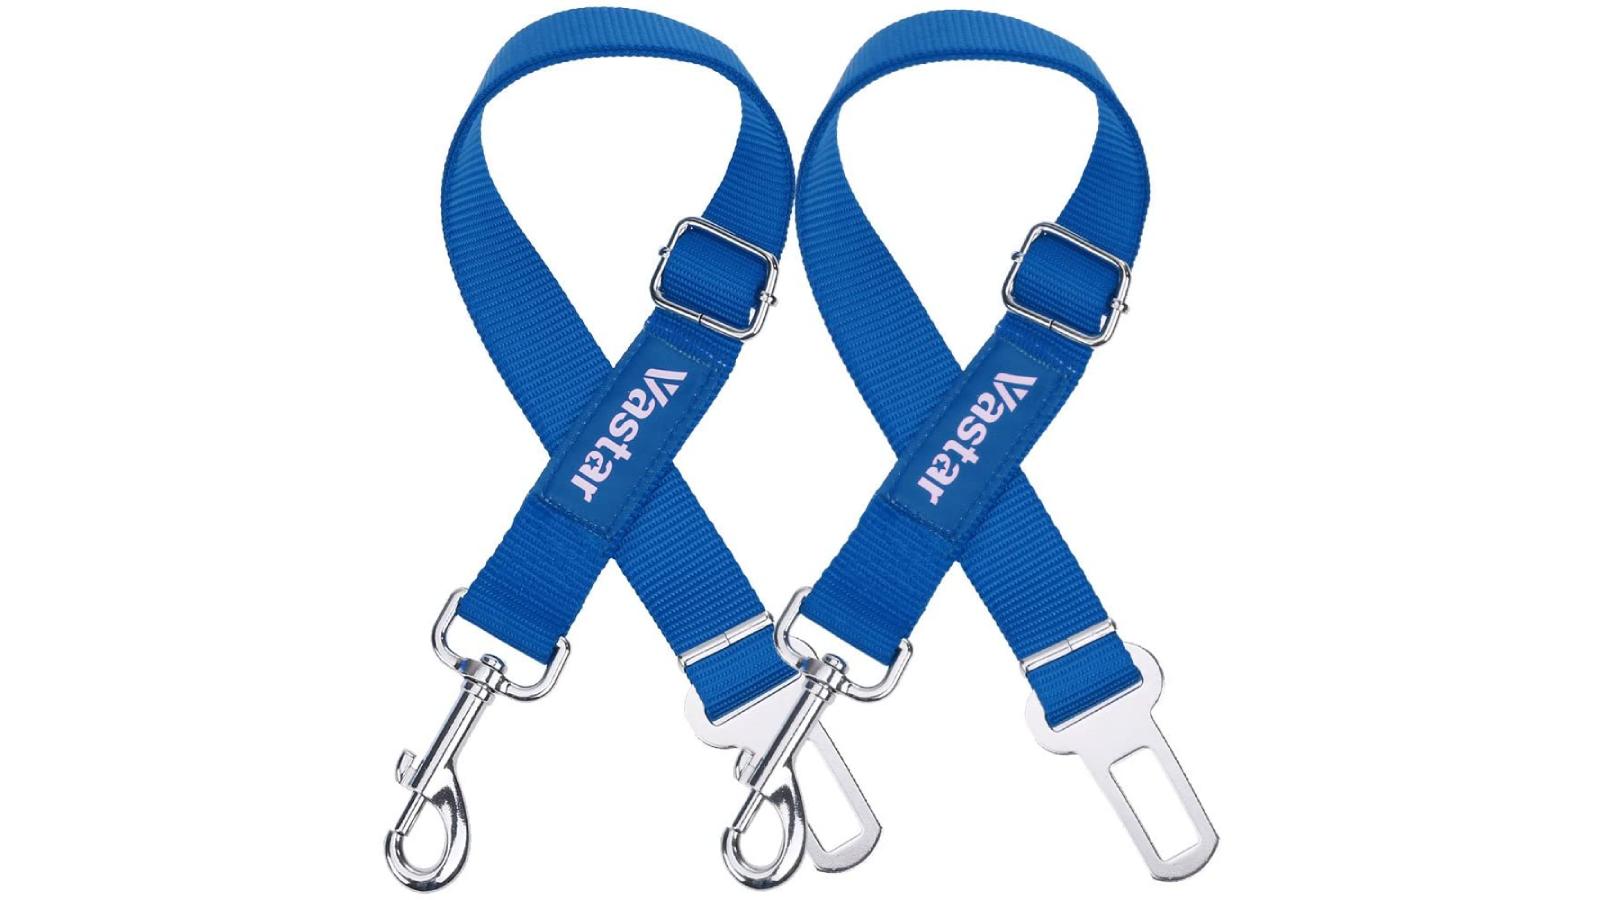 Two blue dog seatbelts.